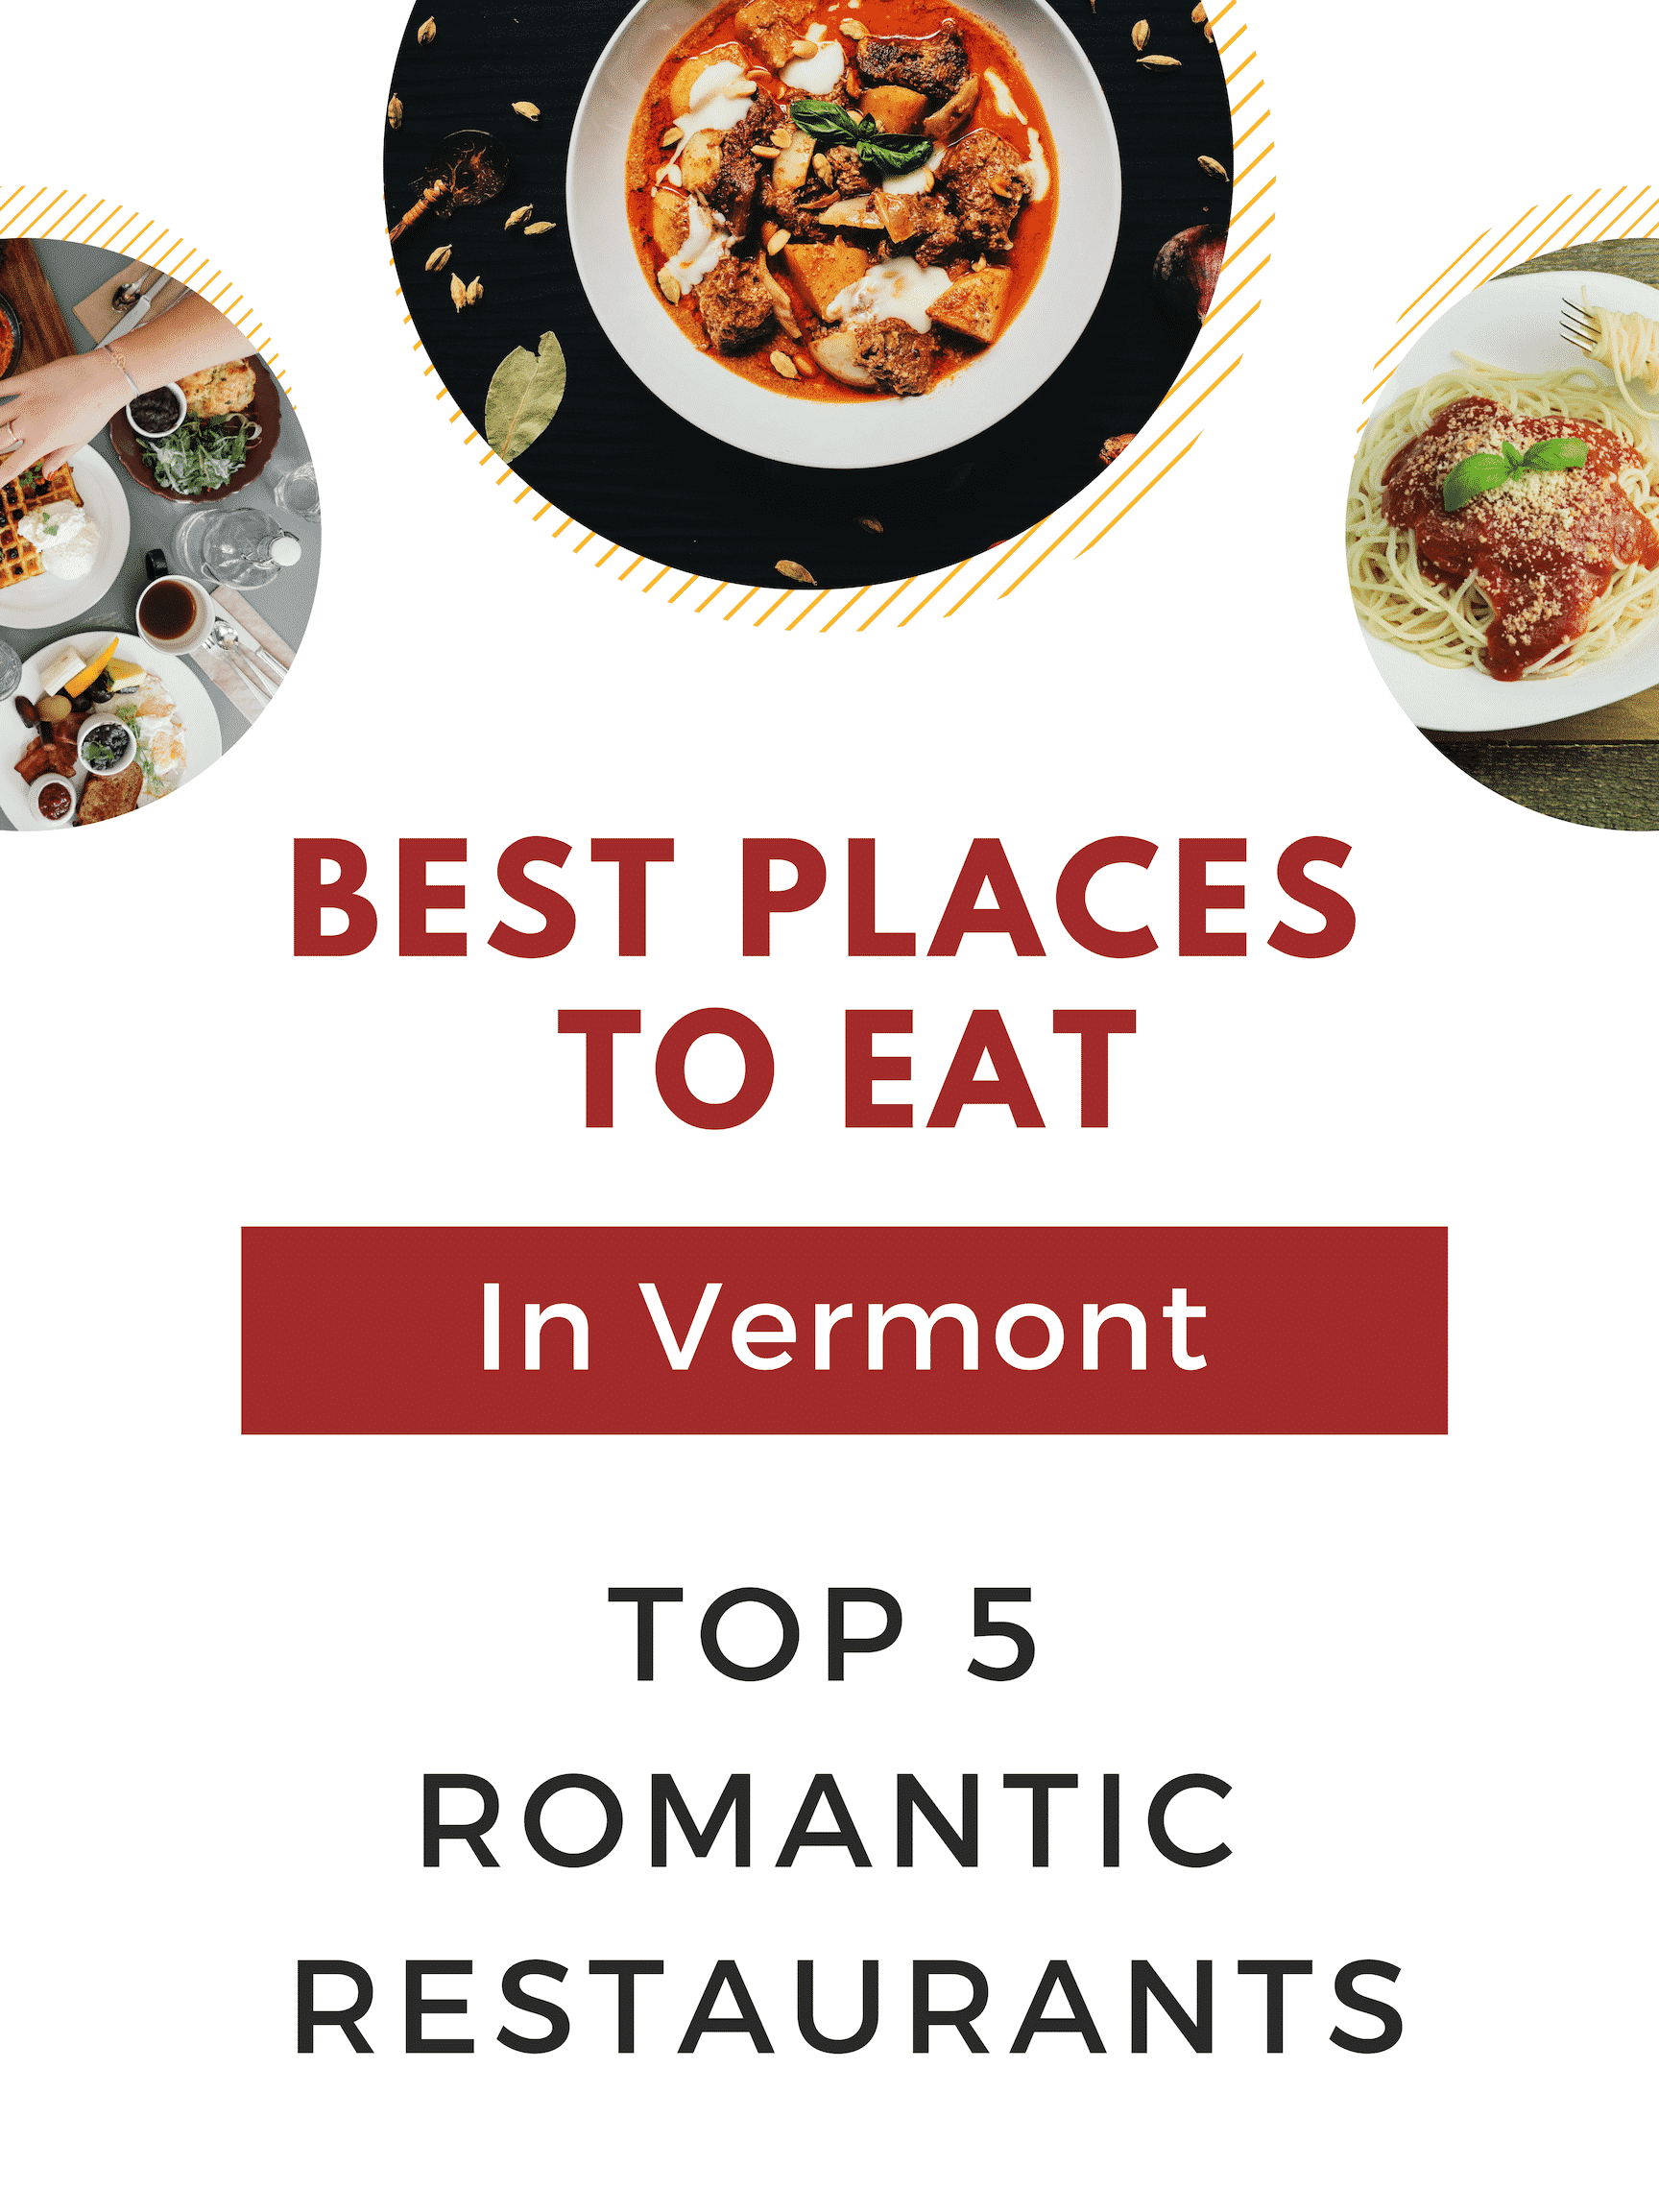 Best Places To Eat In Vermont - 5 Romantic Restaurants